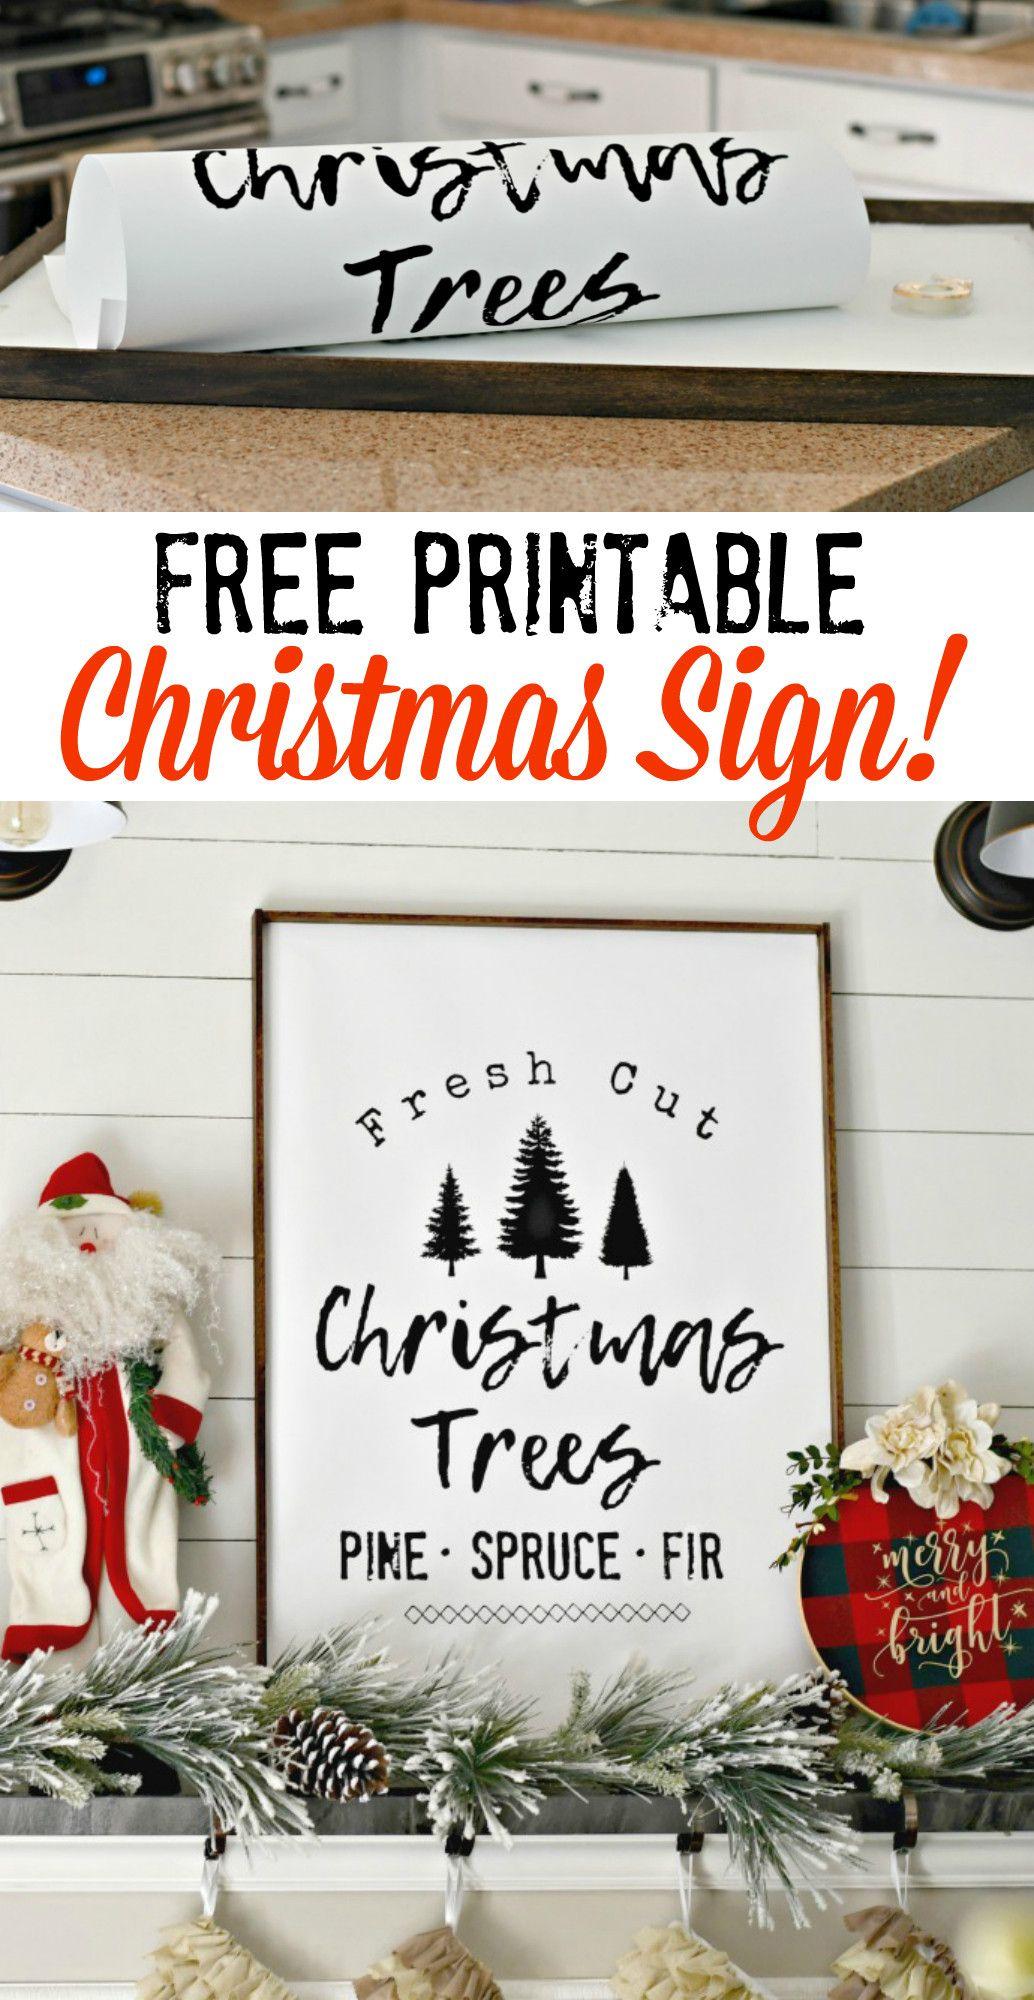 Diy Farmhouse Style Christmas Tree Sign Free Printable Idea Christmas Signs Diy Farmhouse Christmas Ornaments Farmhouse Style Christmas